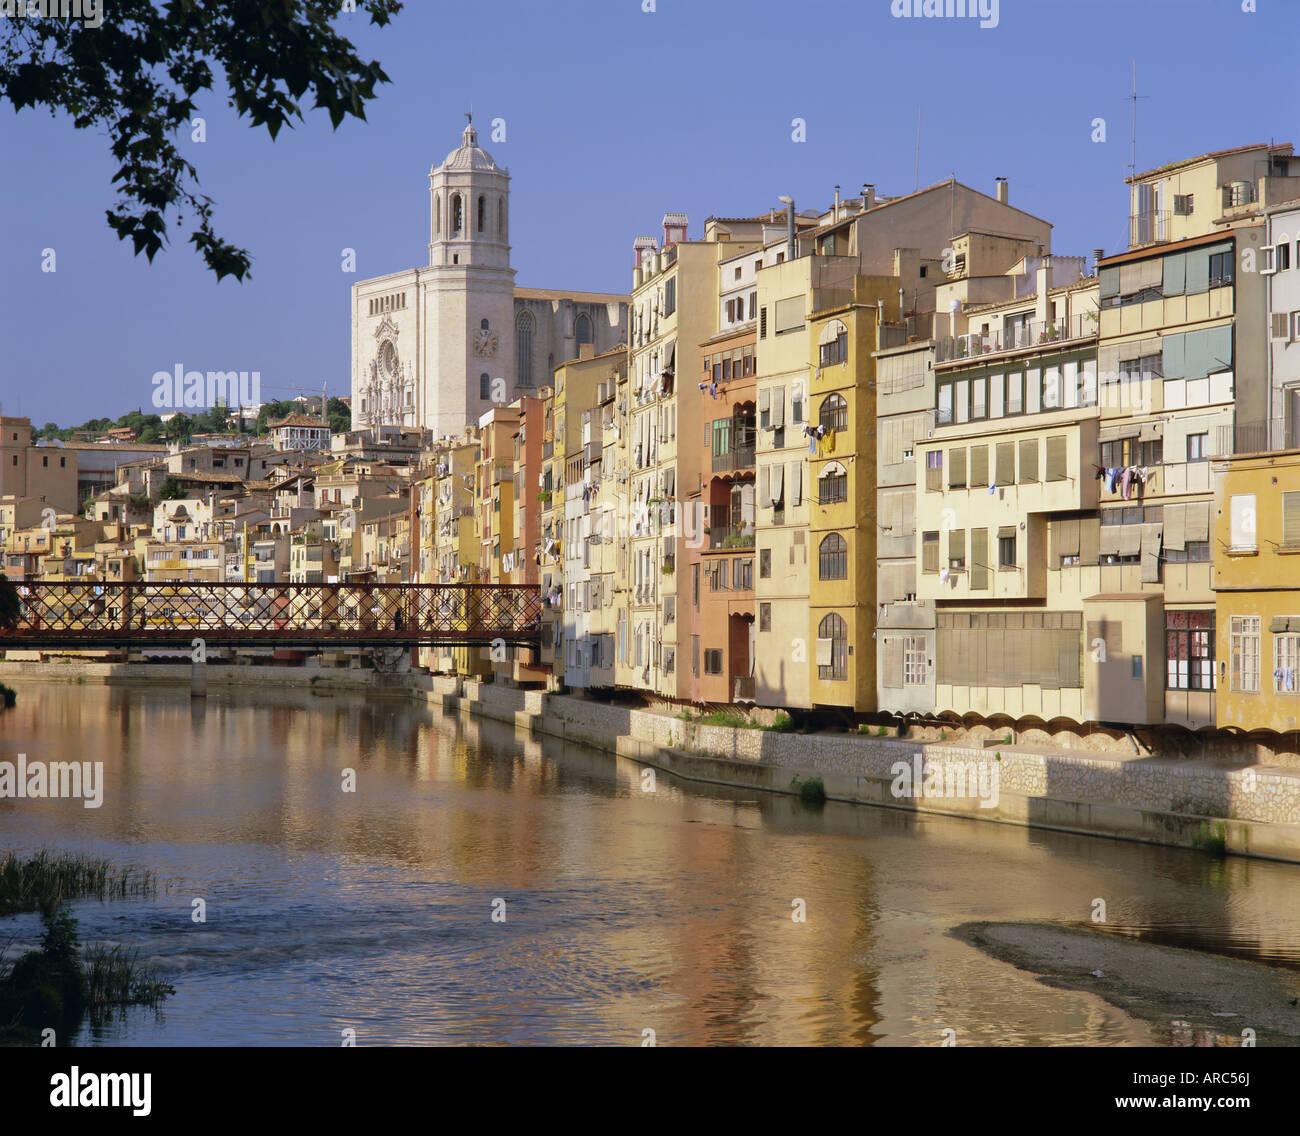 Mittelalterlichen Häusern am Fluss Onyar, Girona, Catalunya (Katalonien) (Cataluna), Spanien, Europa Stockbild